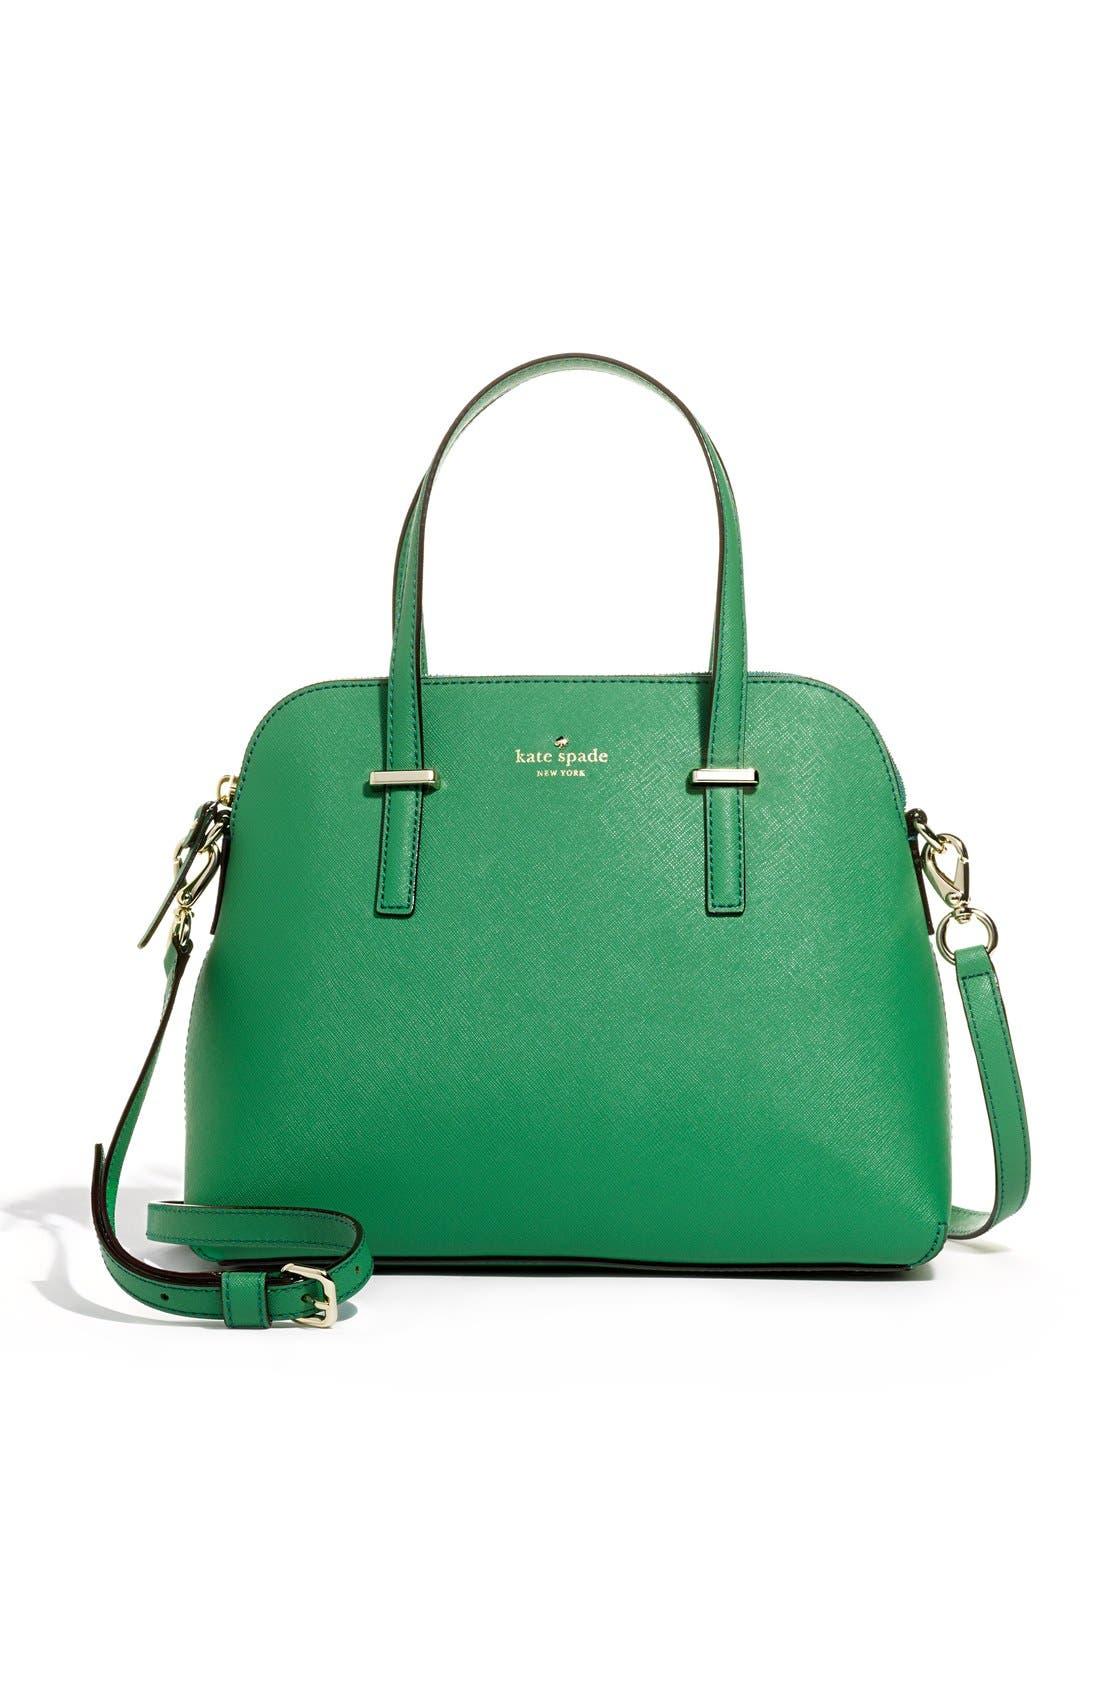 'cedar street - maise' leather satchel,                             Alternate thumbnail 2, color,                             075